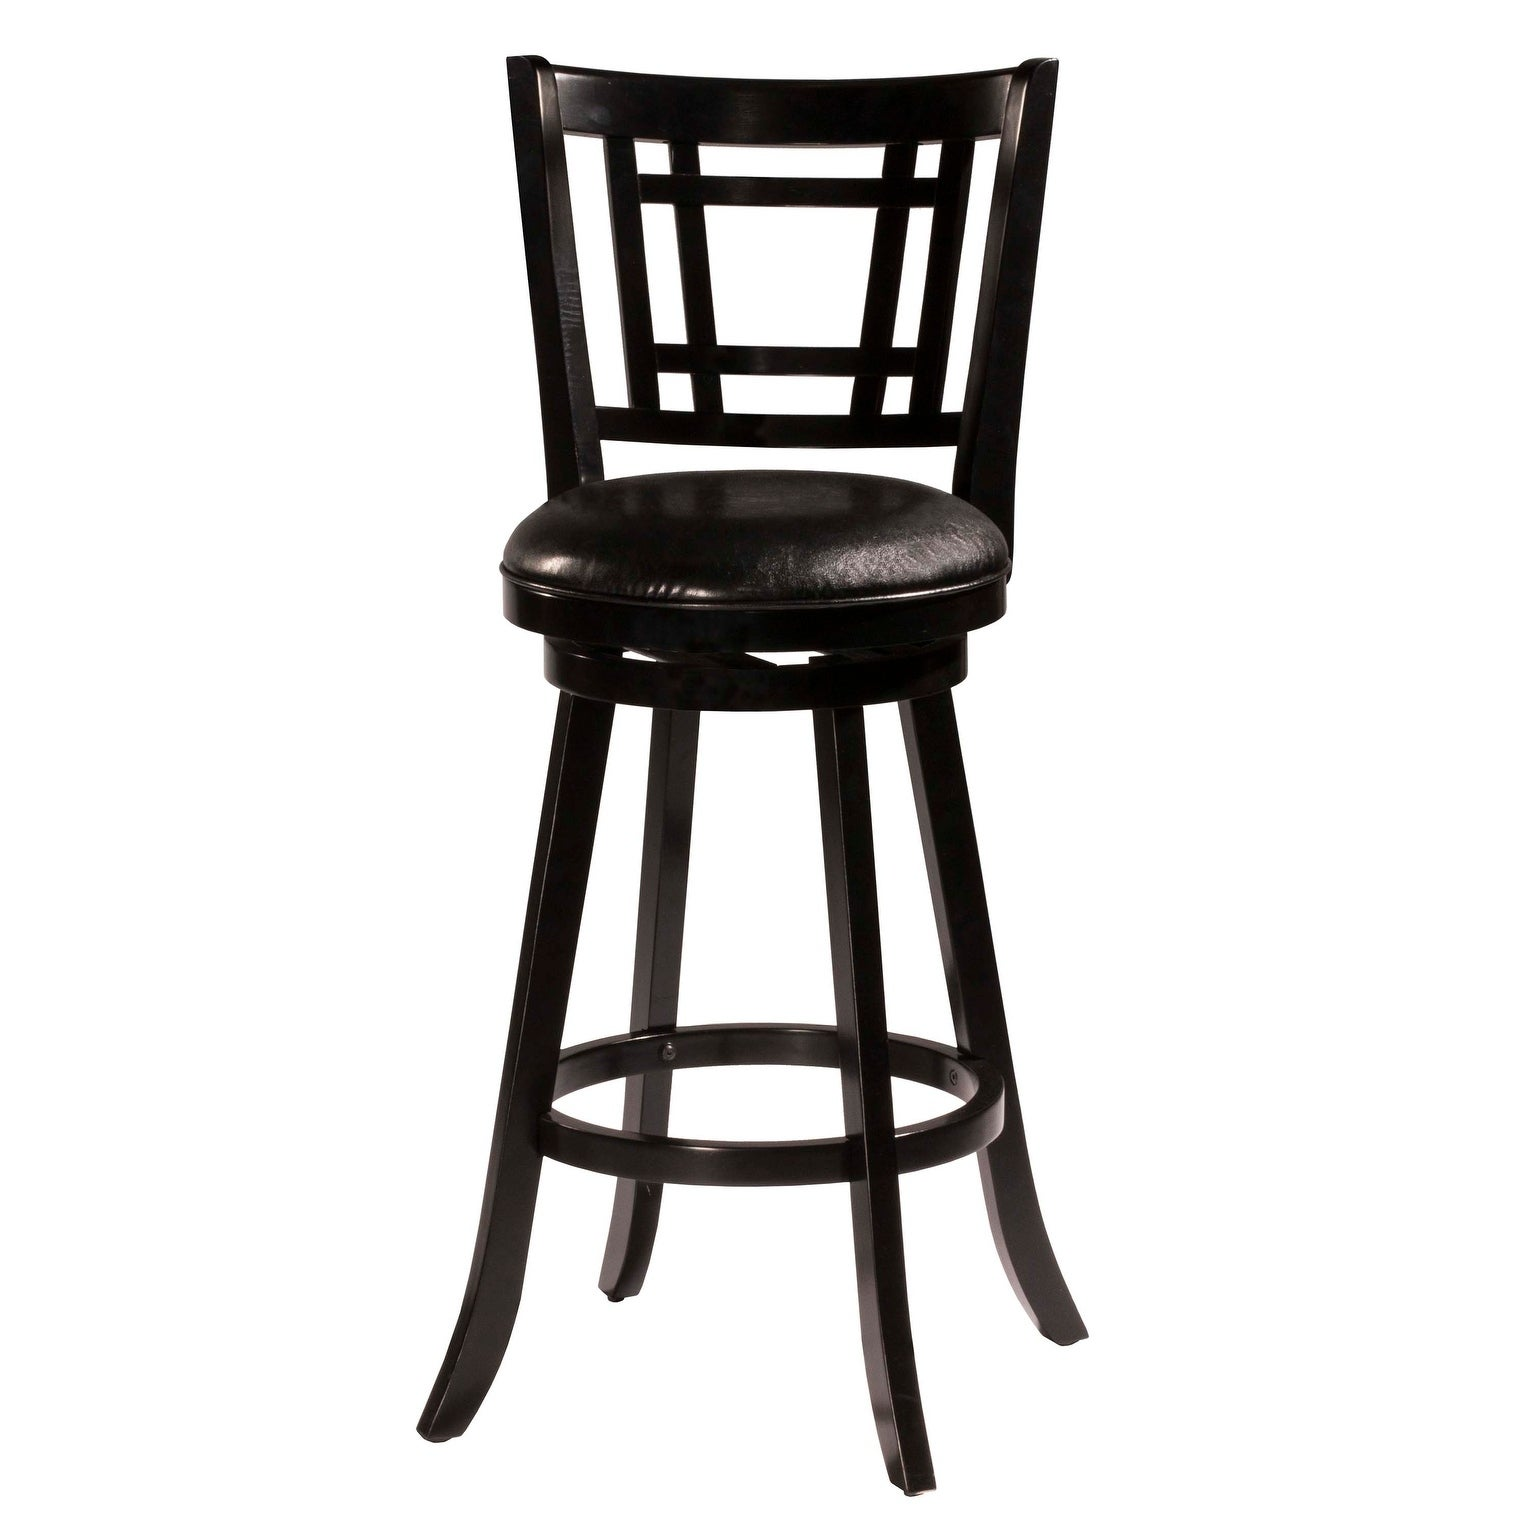 Ebay Bar Furniture: Hillsdale Furniture Fairfox Swivel Bar Stool, Black, 30